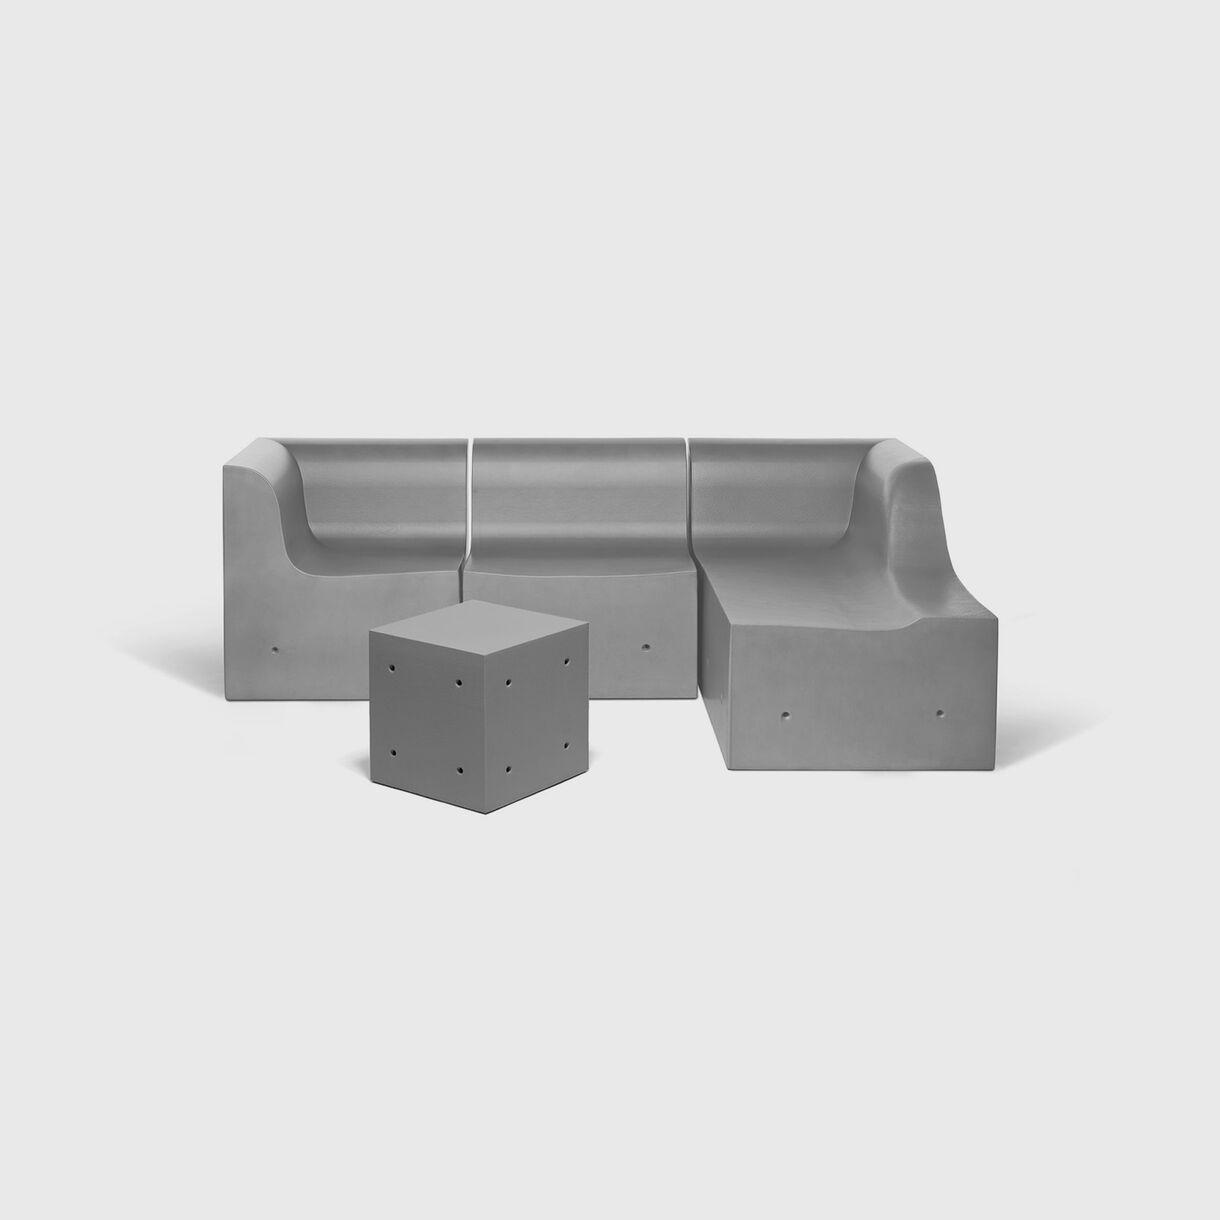 Softcrete Sofa